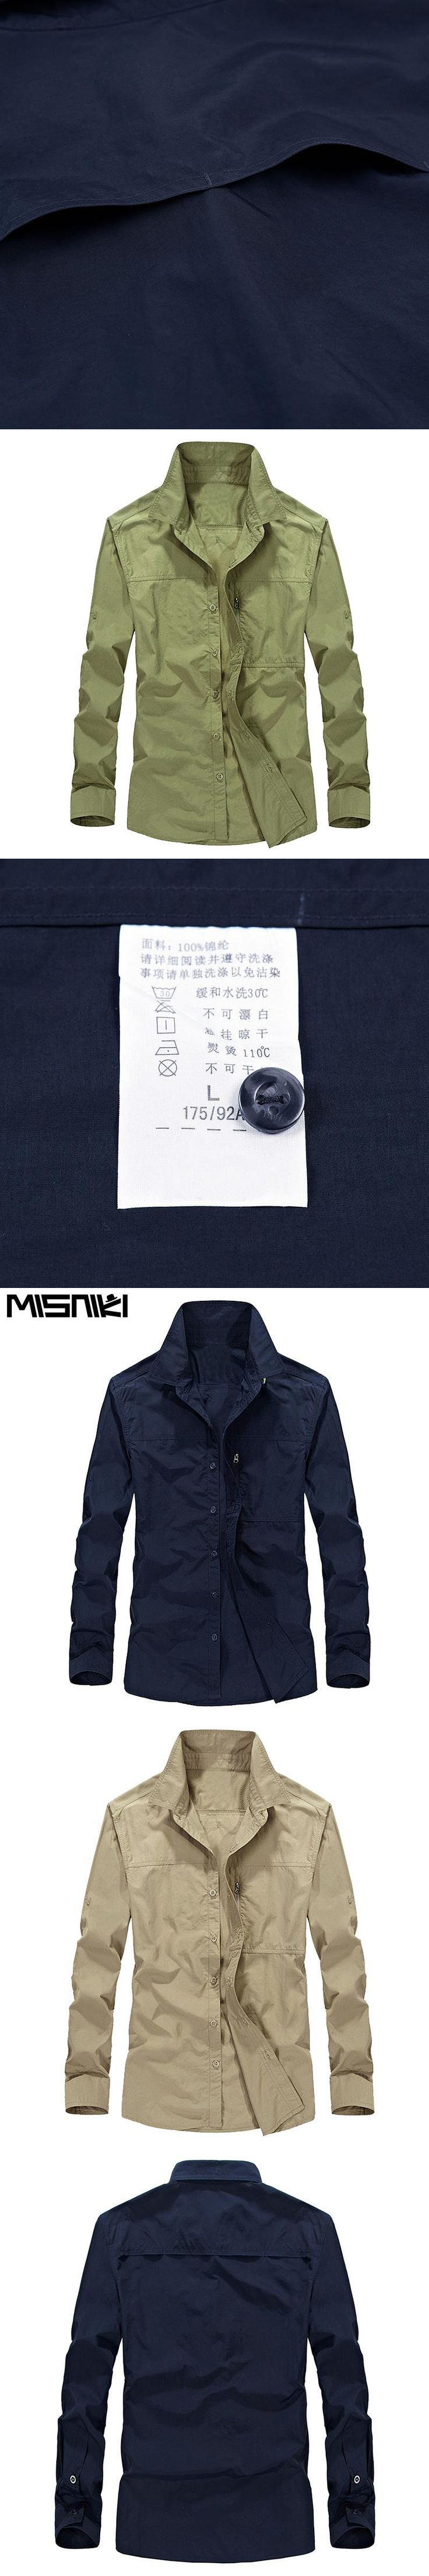 MISNIKI New arrivals fashion men cargo shirts solid color cotton military long sleeve dress shirts M-4XL JPCS06